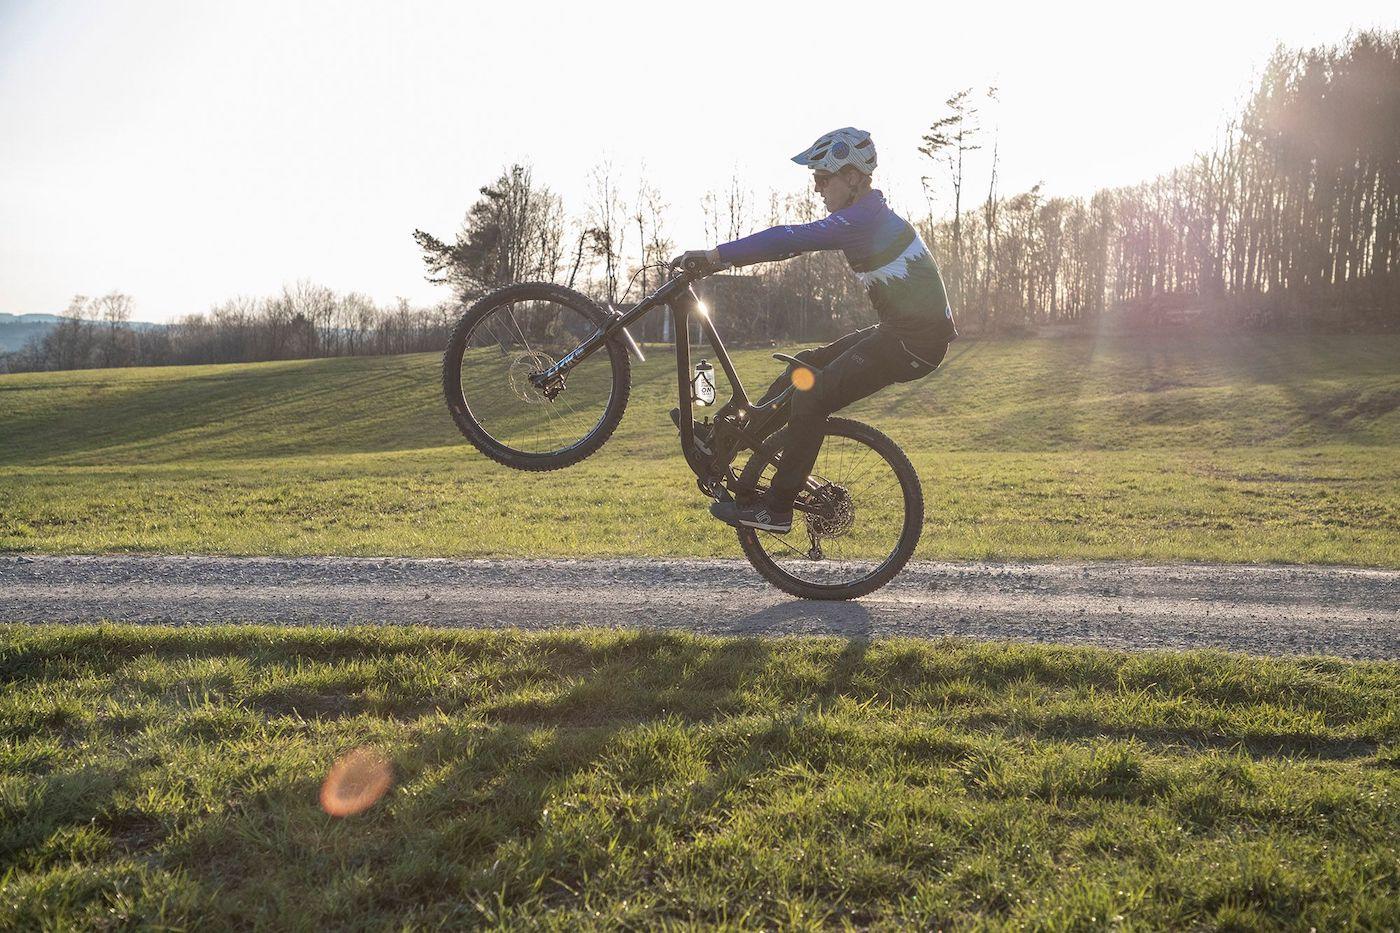 Experten Fahrtechnik Kurs in Heidelberg - Mountainbike Training - Rock my Trail 2